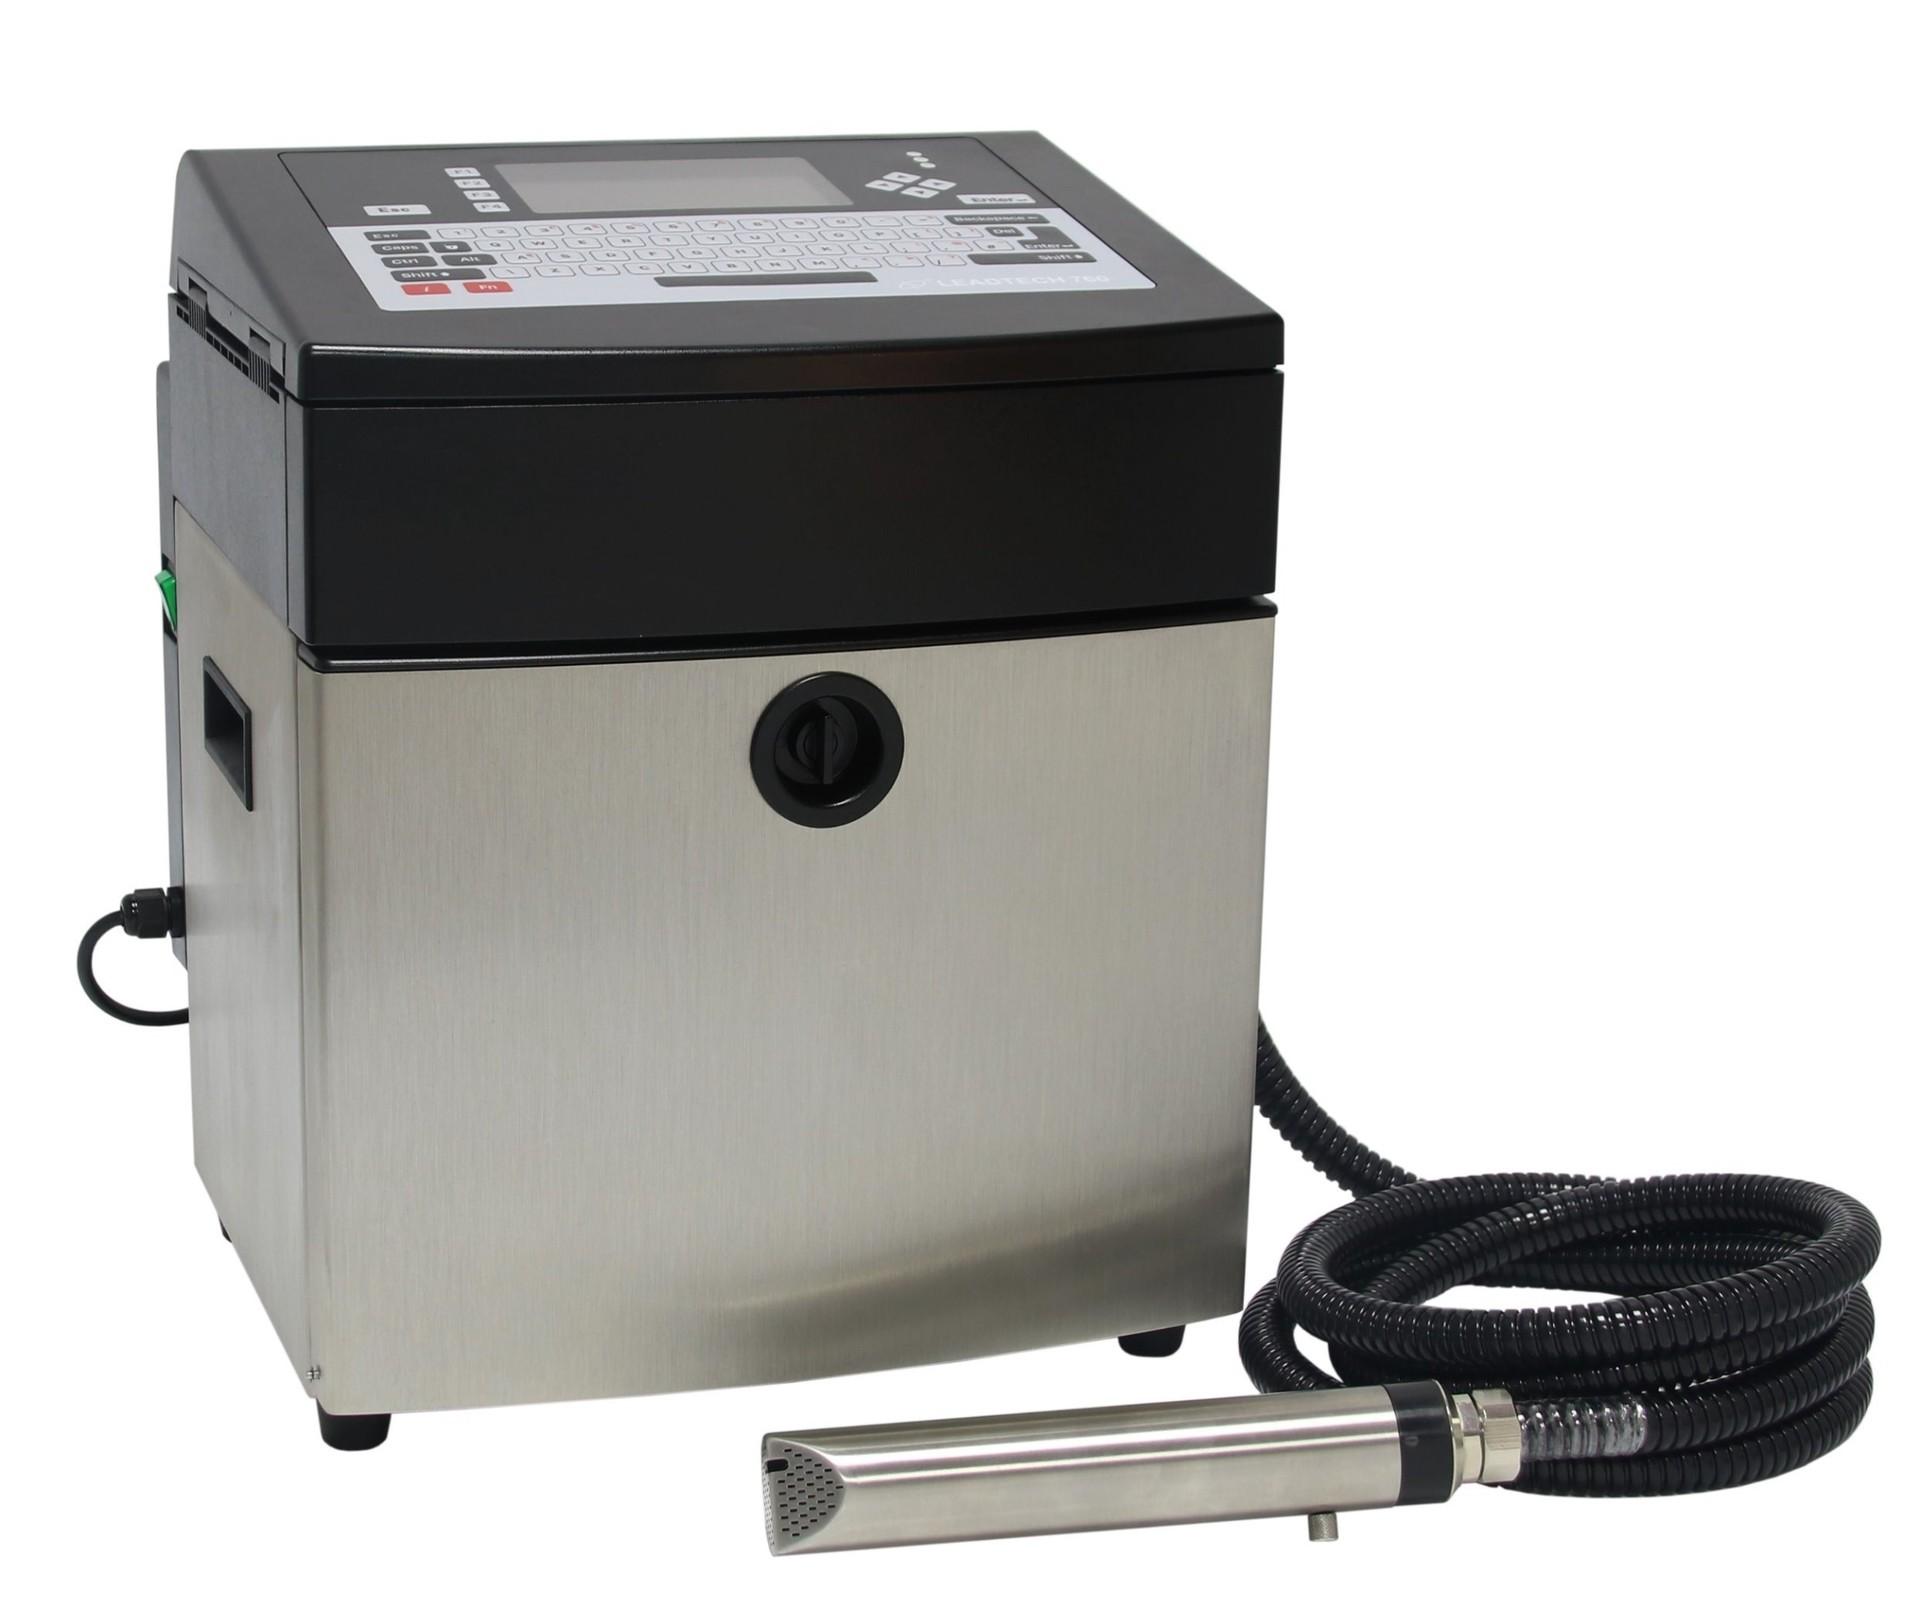 Lead Tech Lt760 HDPE Coding Continuous Cij Inkjet Printer